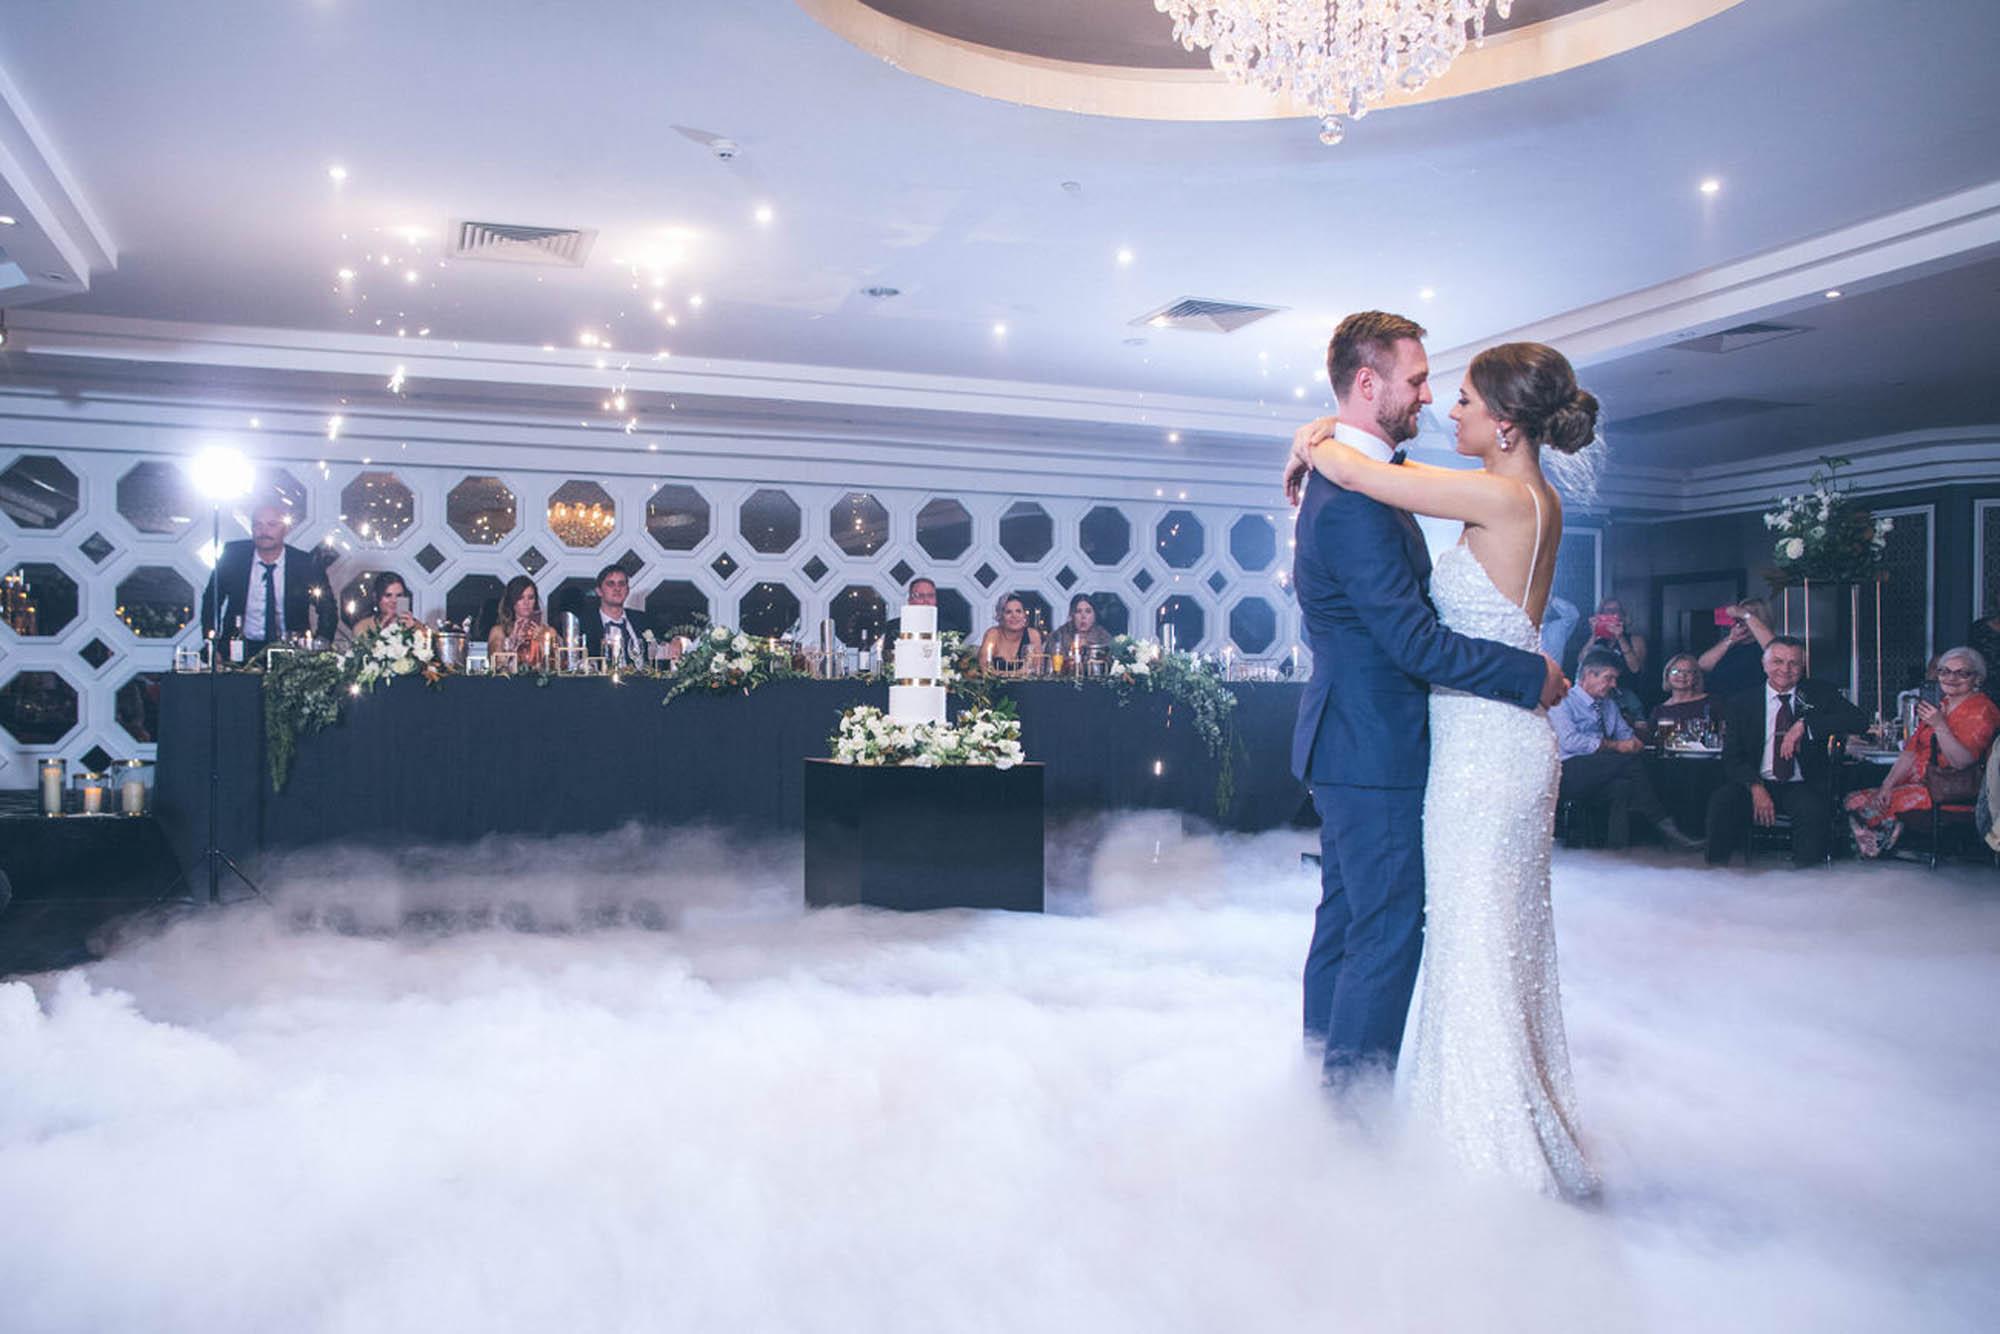 MacDougall-Photography-Sydney-Wedding-Photographers-75.jpg